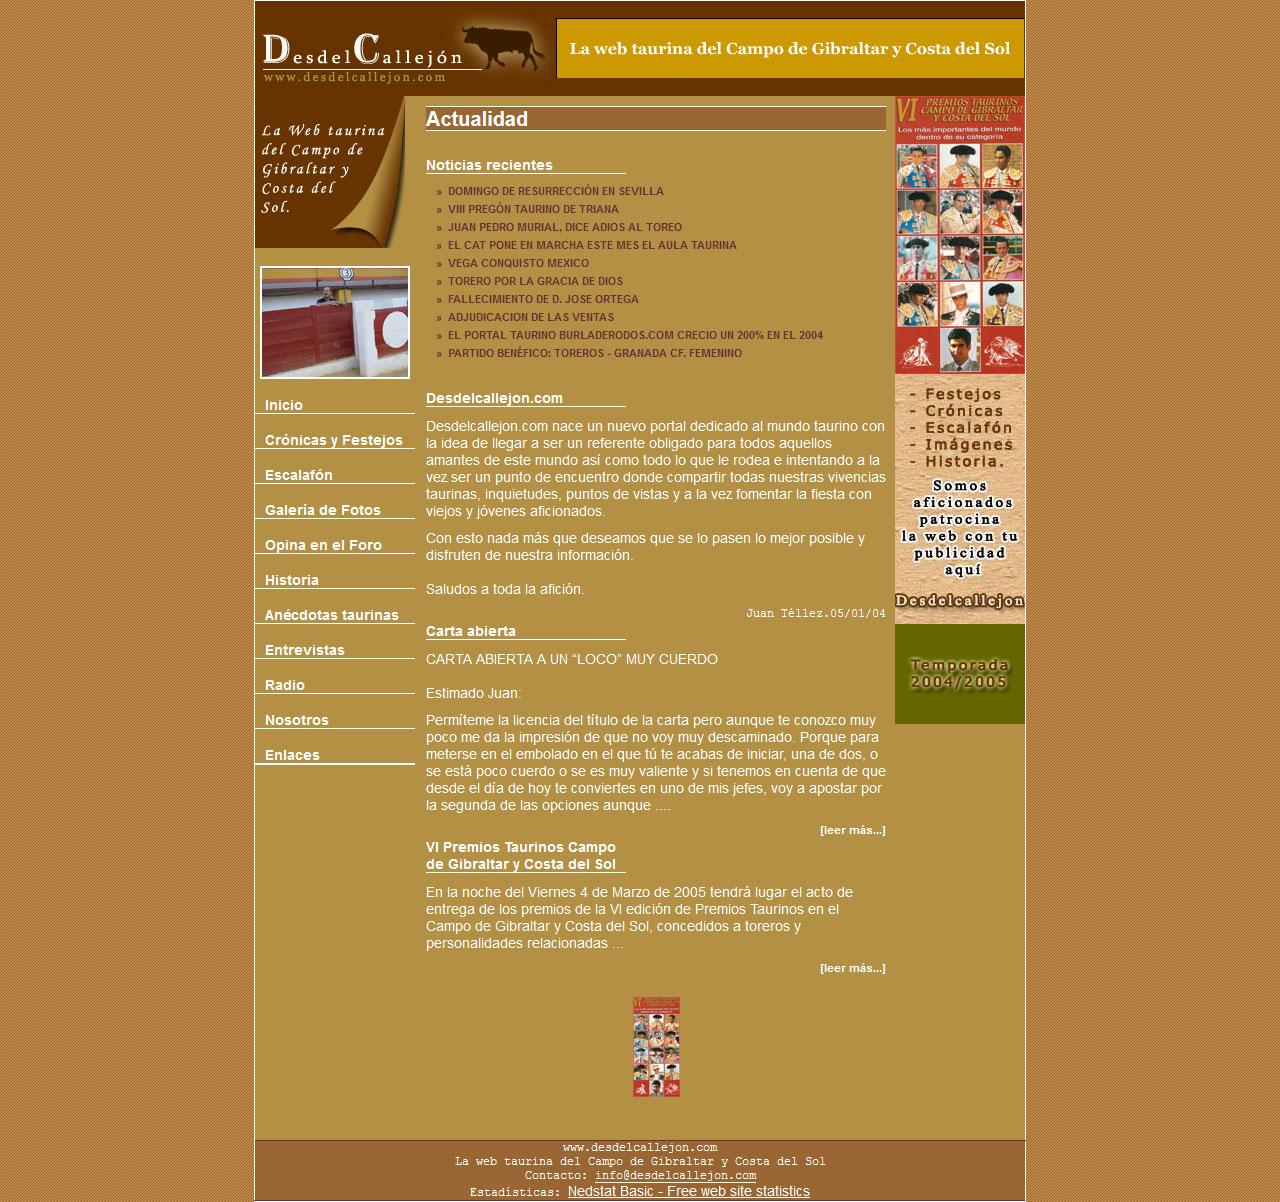 Desdelcallejon - La web taurina del Campo de Gibraltar y Costa del Sol - Html, Css, phpBB2, Mysql, Dreamweaver, Photoshop, Flash. Año 2005